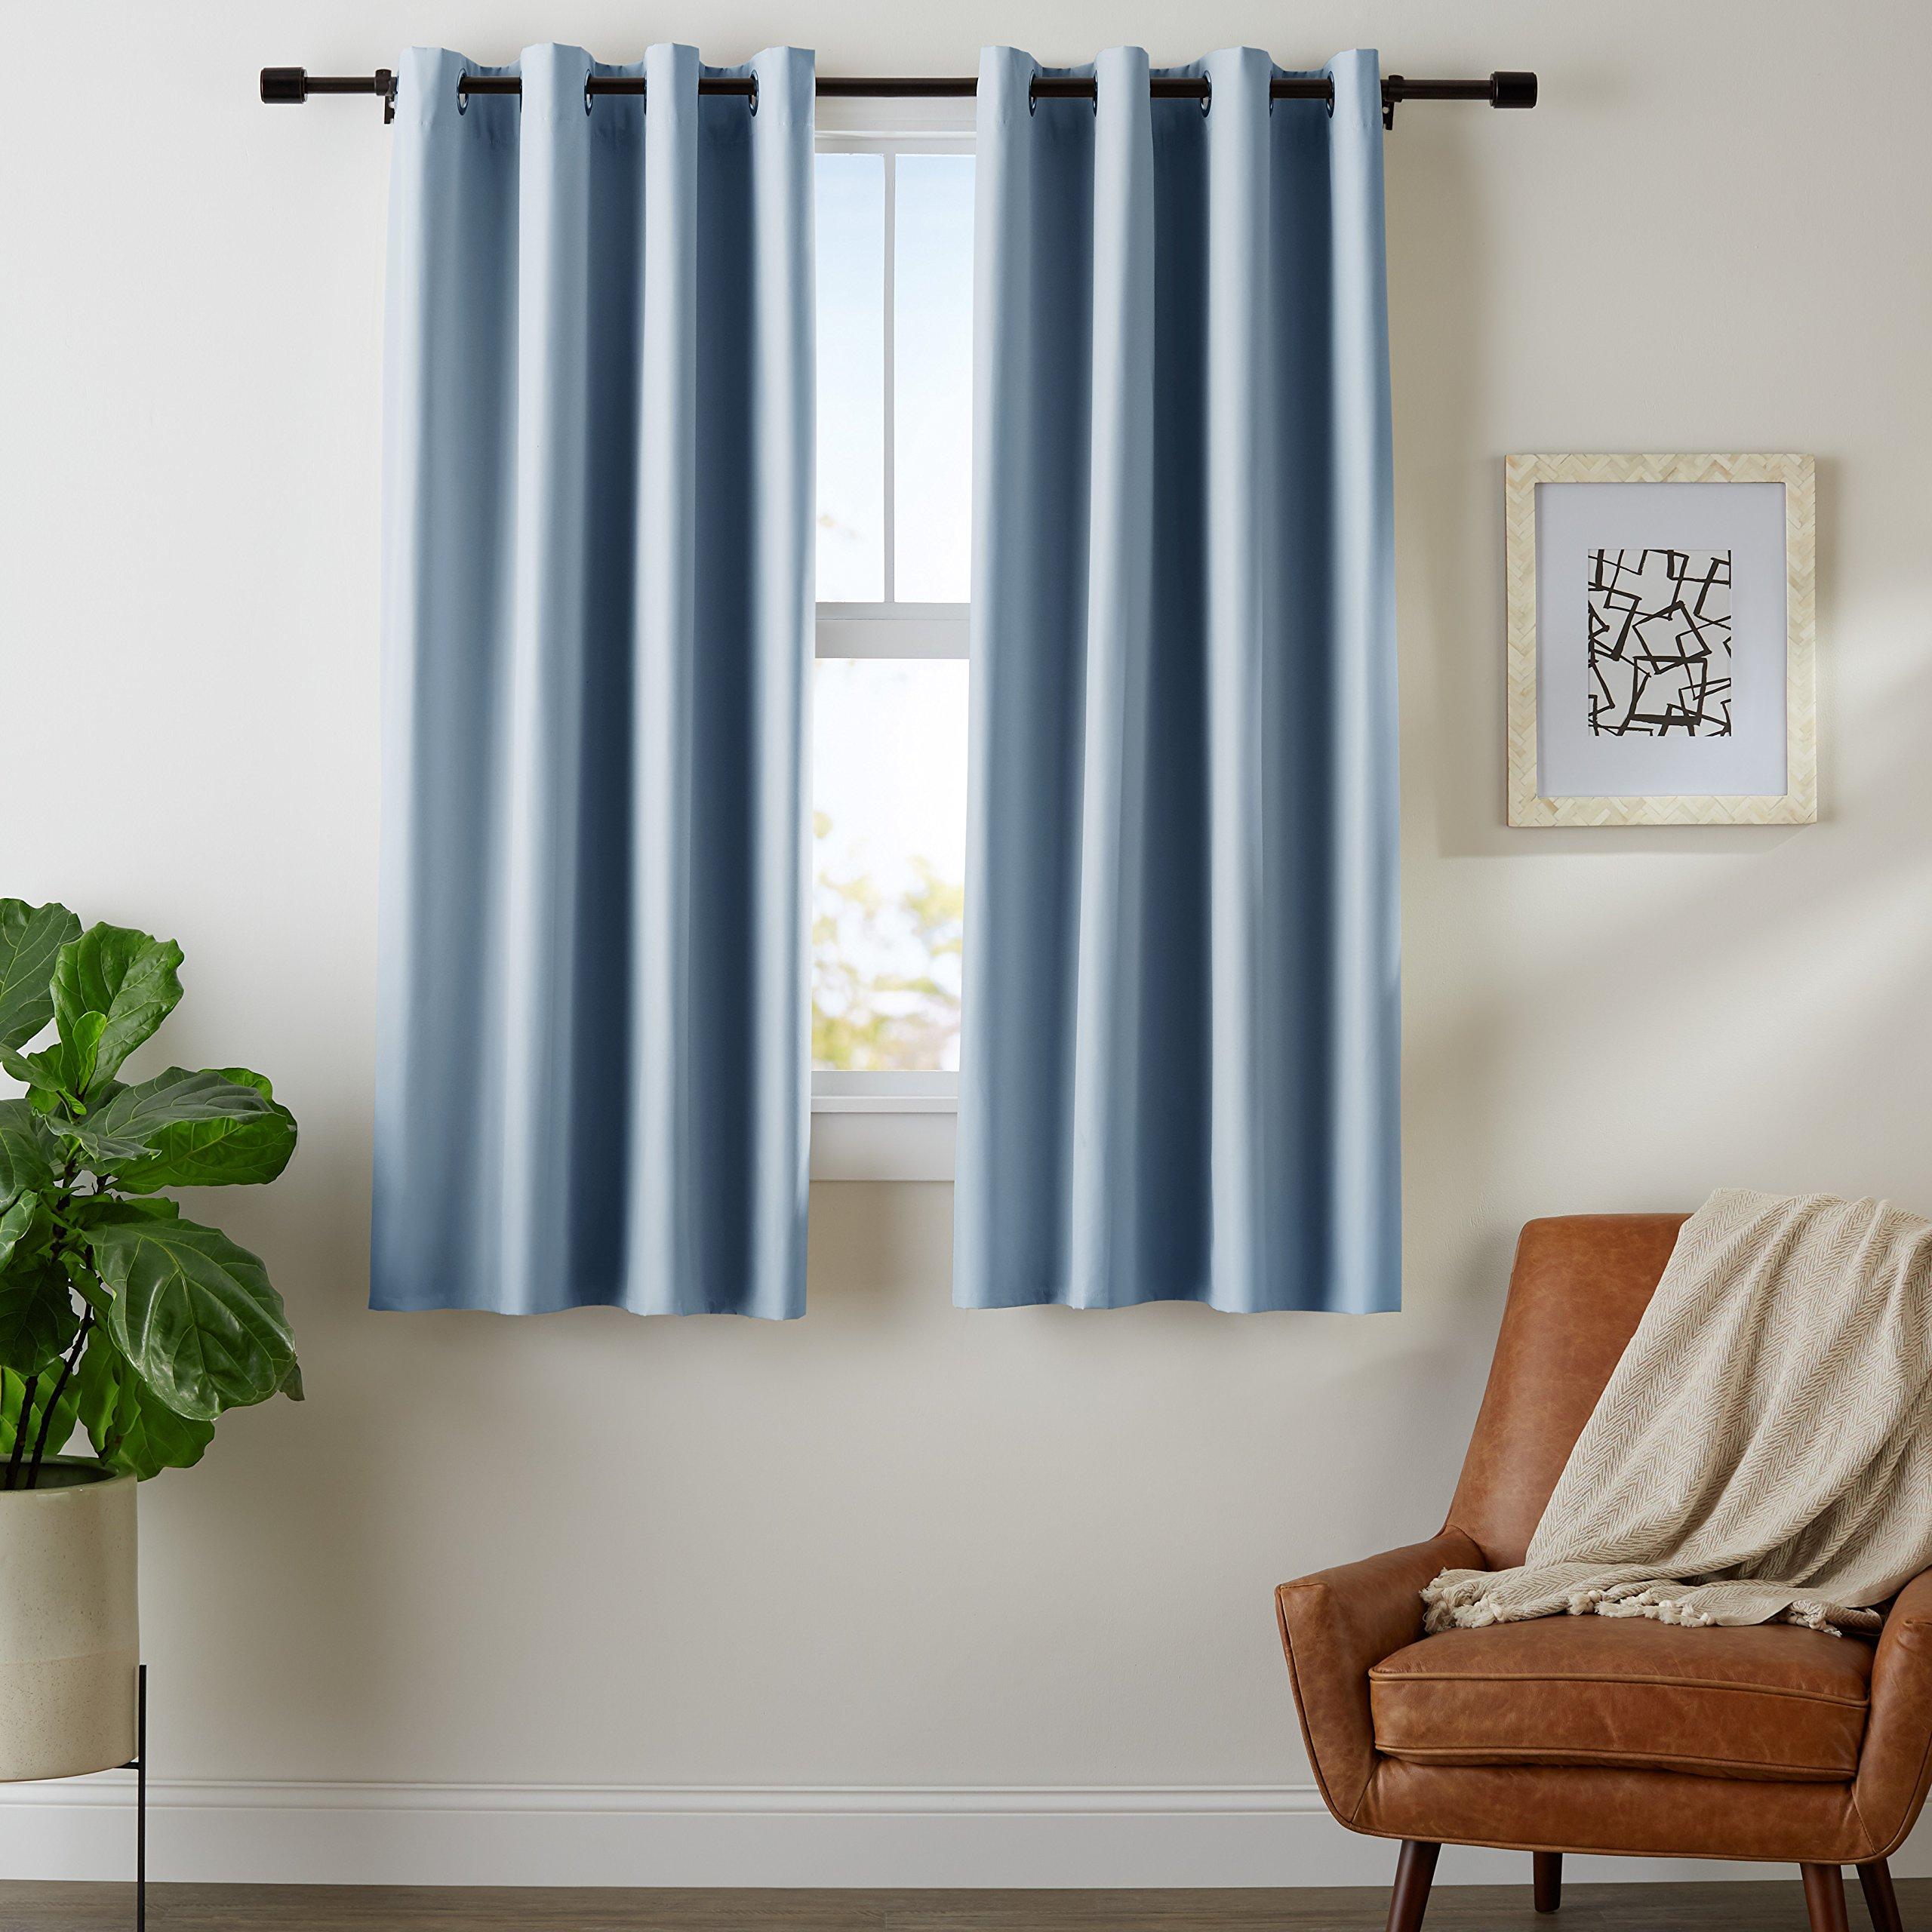 AmazonBasics Room-Darkening Blackout Curtain Set with Grommets - 42'' x 63'', Smoke Blue